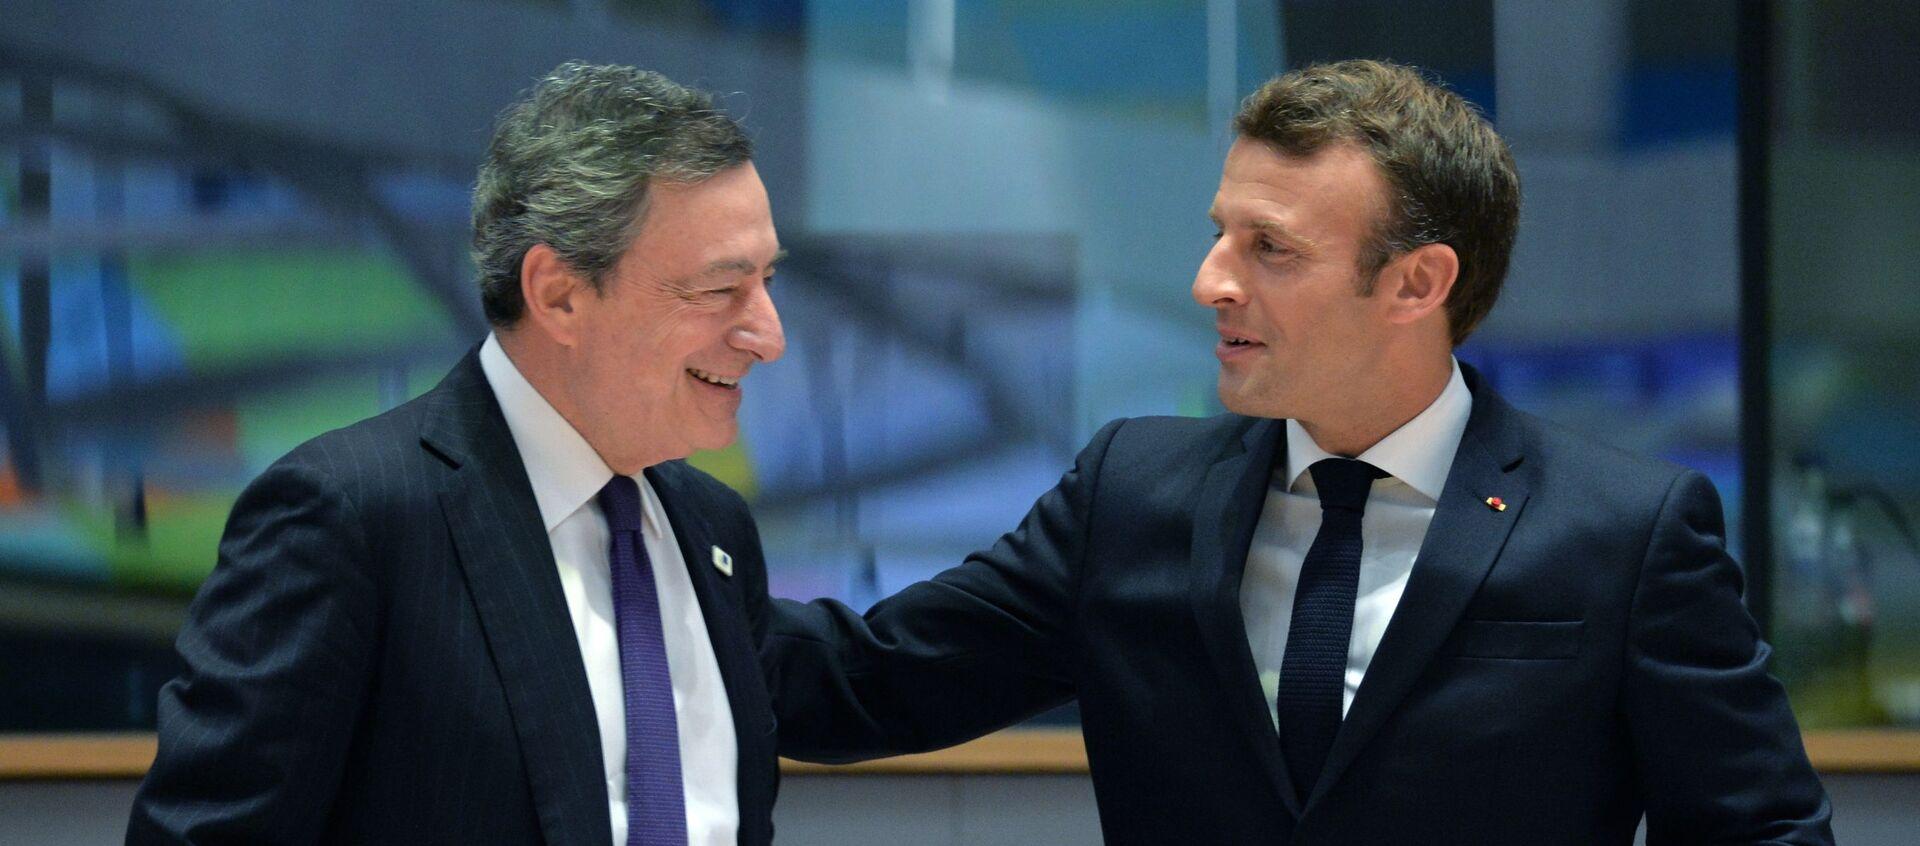 Mario Draghi e Emmanuel Macron - Sputnik Italia, 1920, 16.03.2021